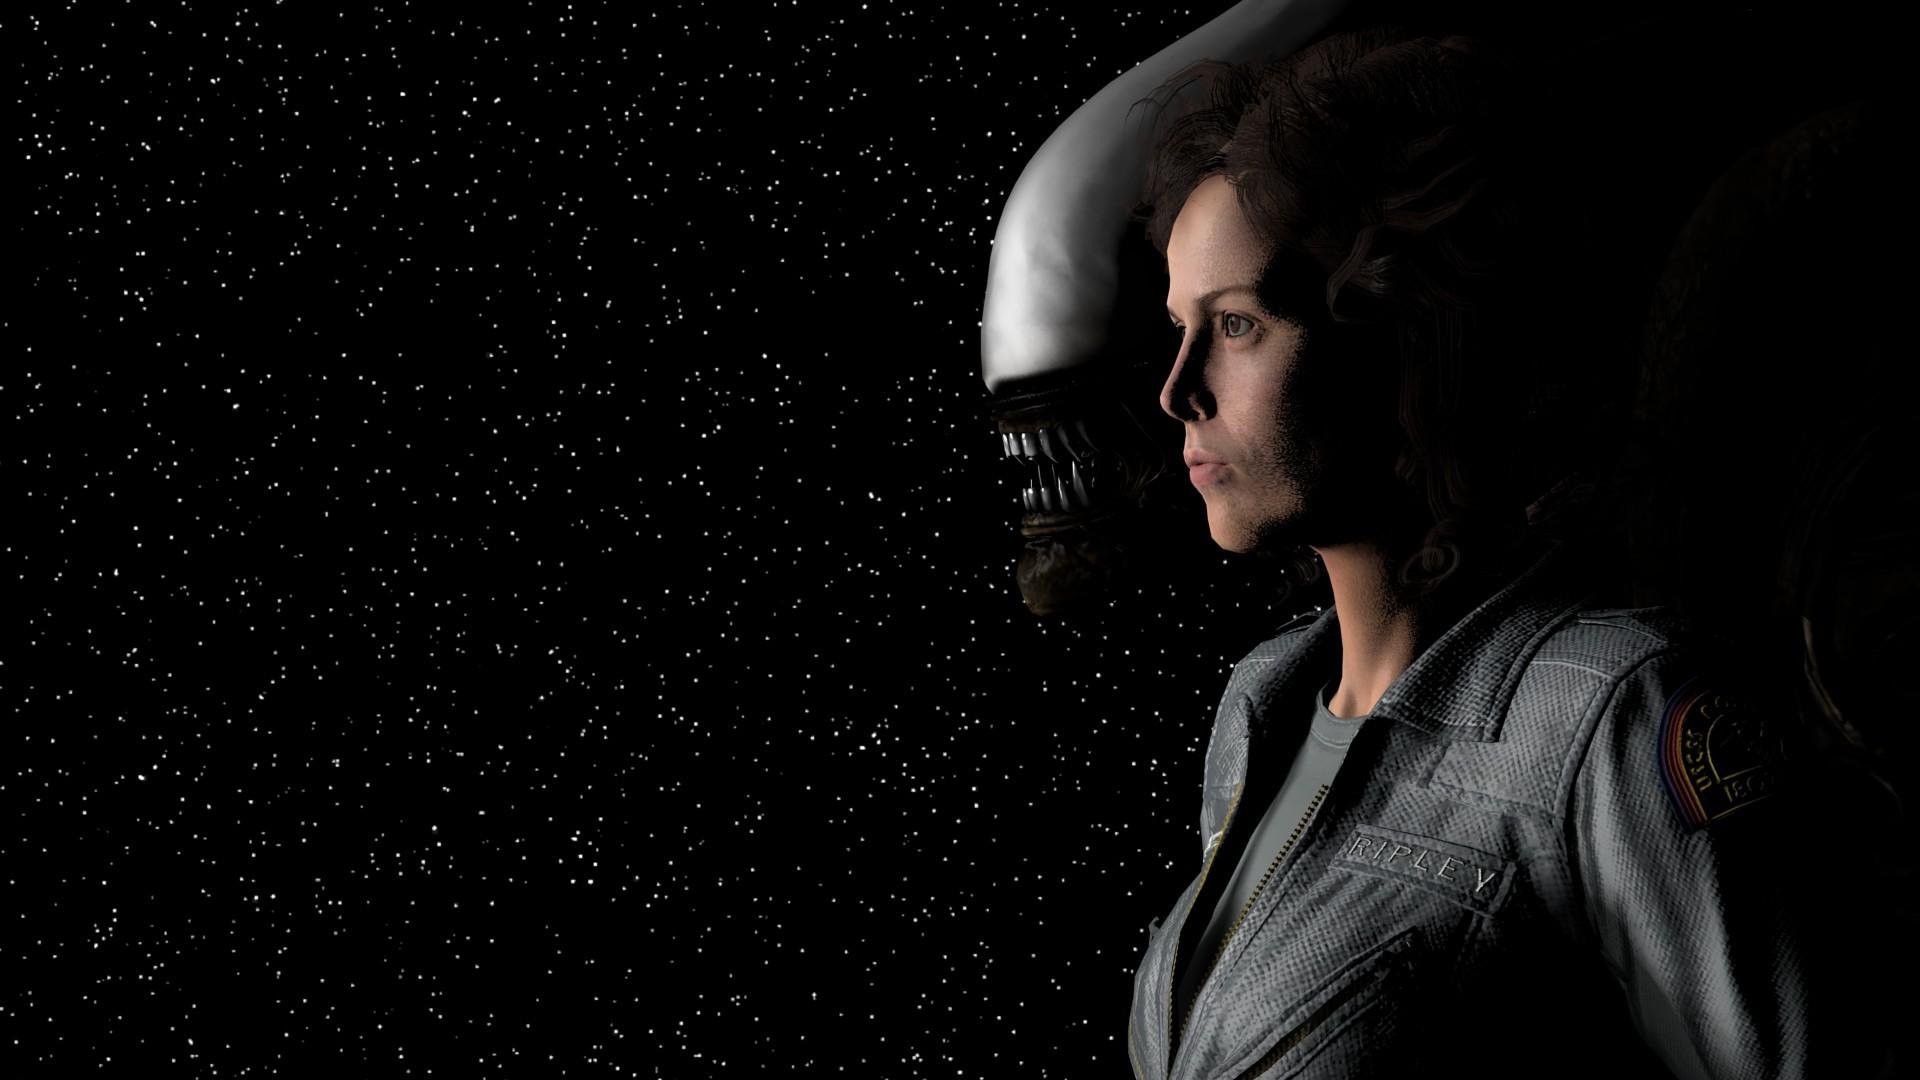 General women actress movies space Alien (movie) Sigourney Weaver  Ellen Ripley astronaut stars